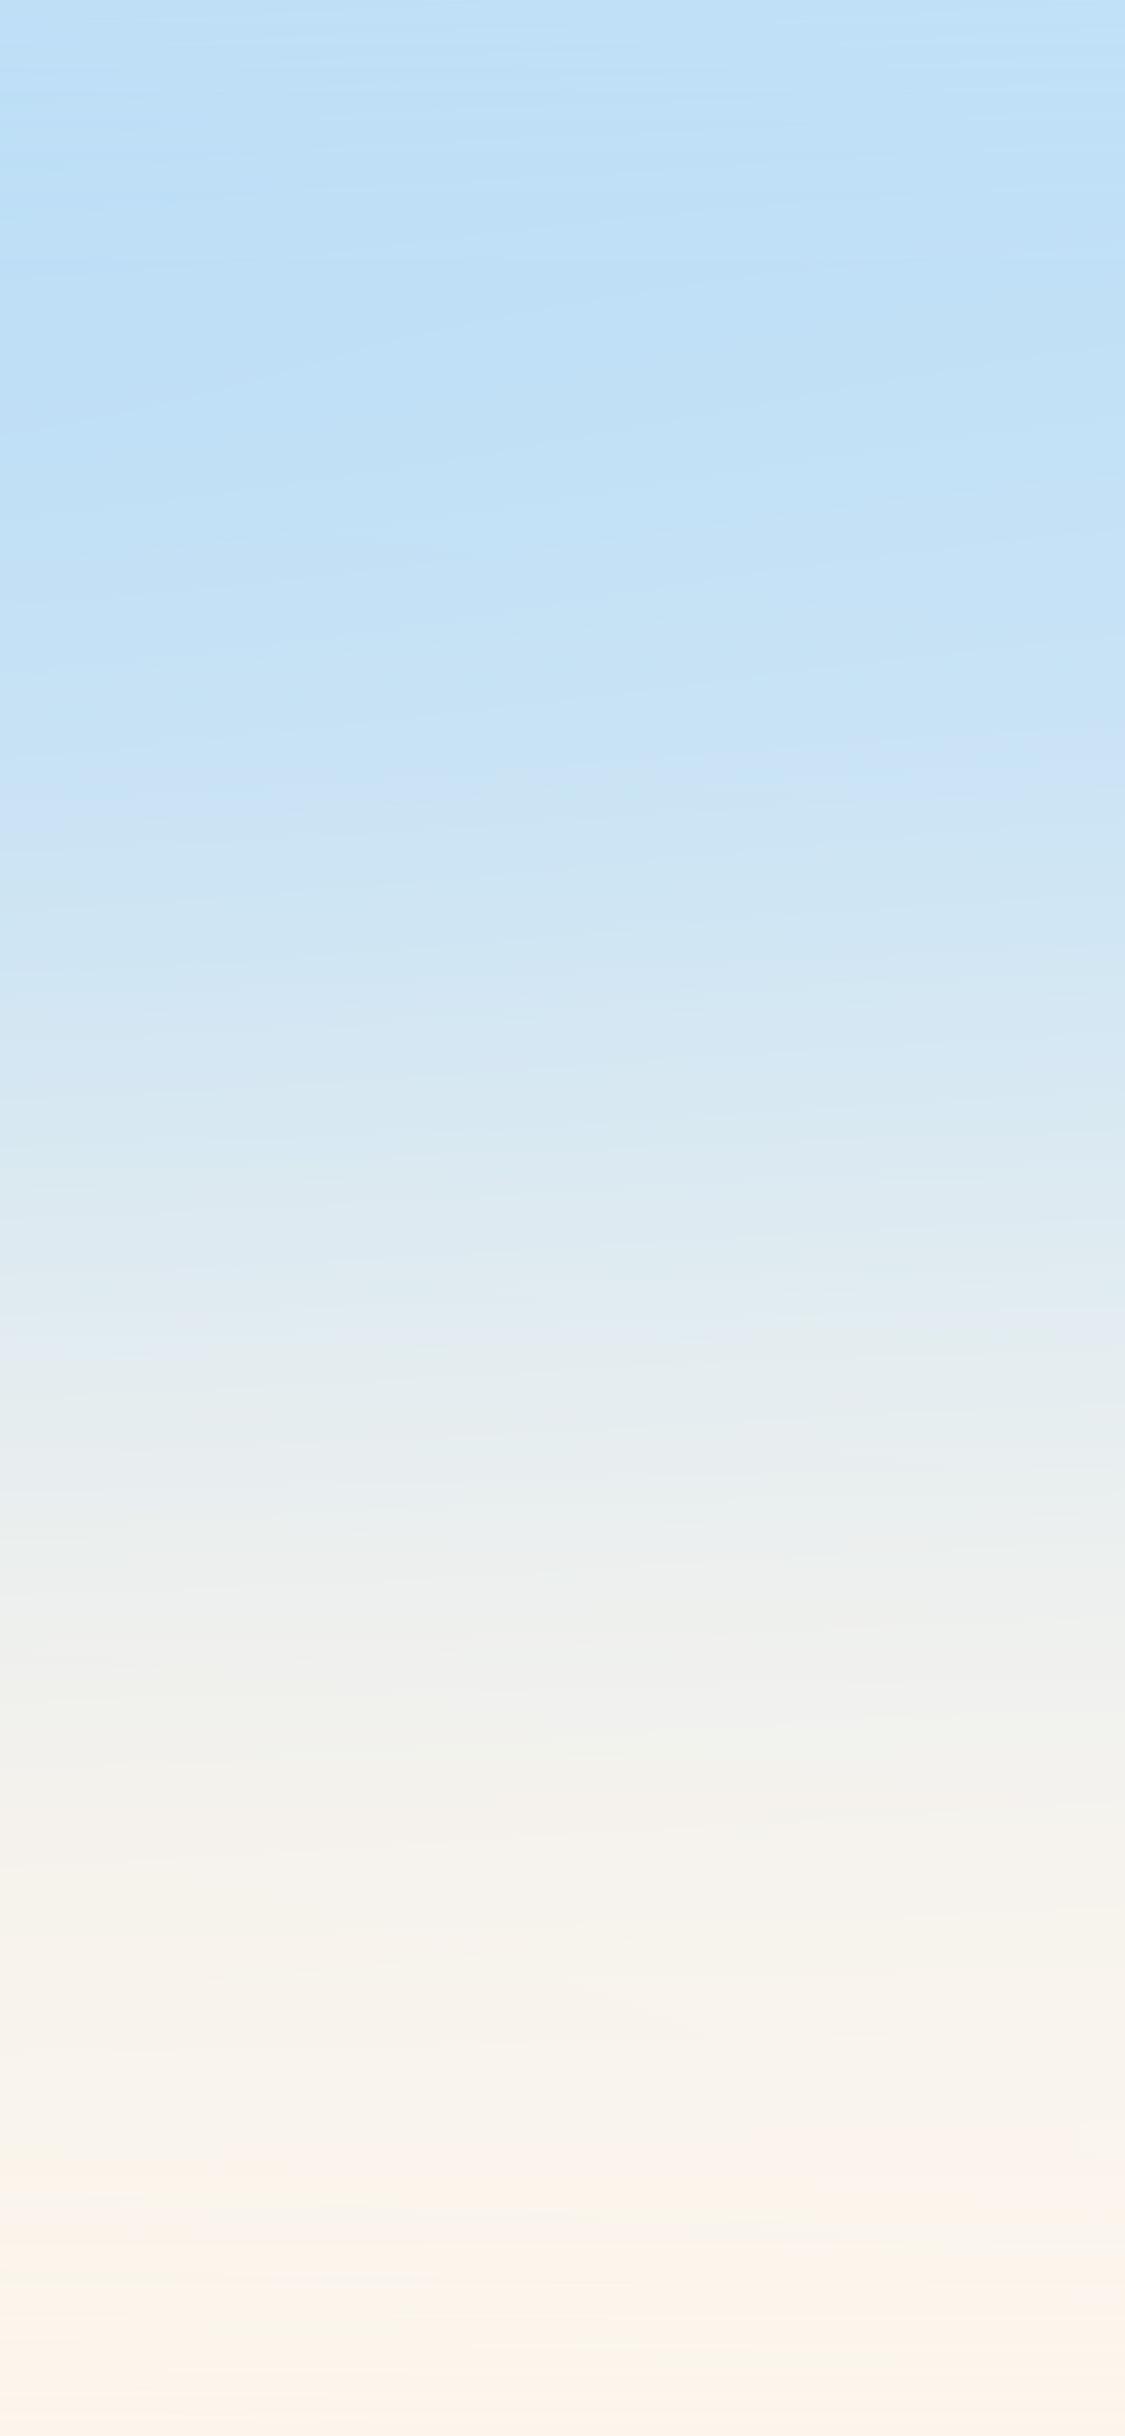 iPhonexpapers.com-Apple-iPhone-wallpaper-sn25-blue-candybar-blur-gradation